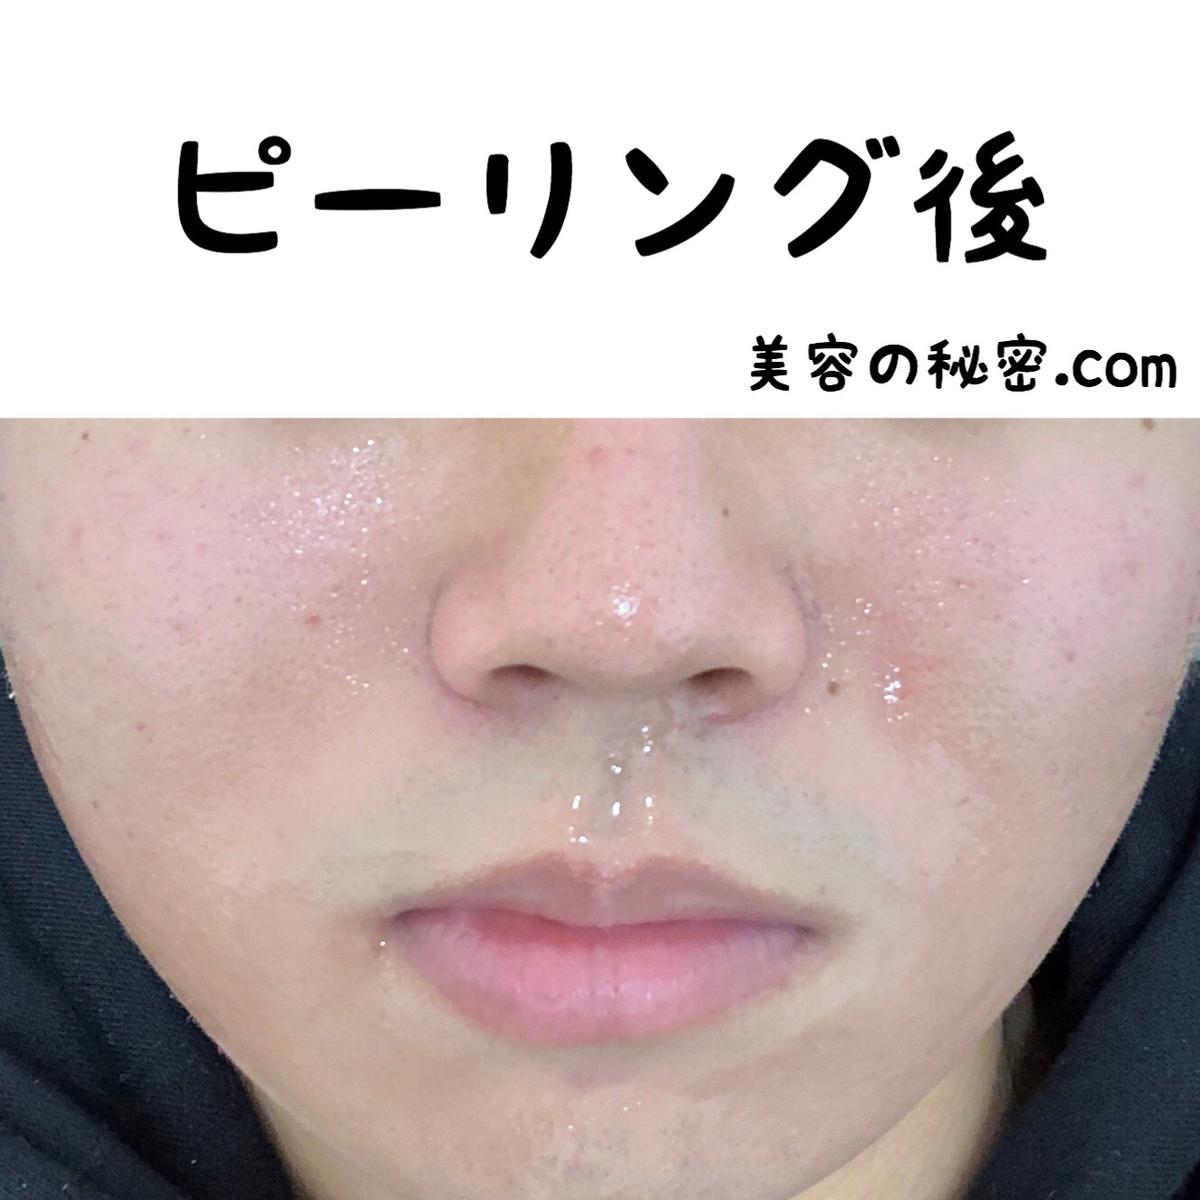 f:id:nokonoko_o:20200806150816j:plain